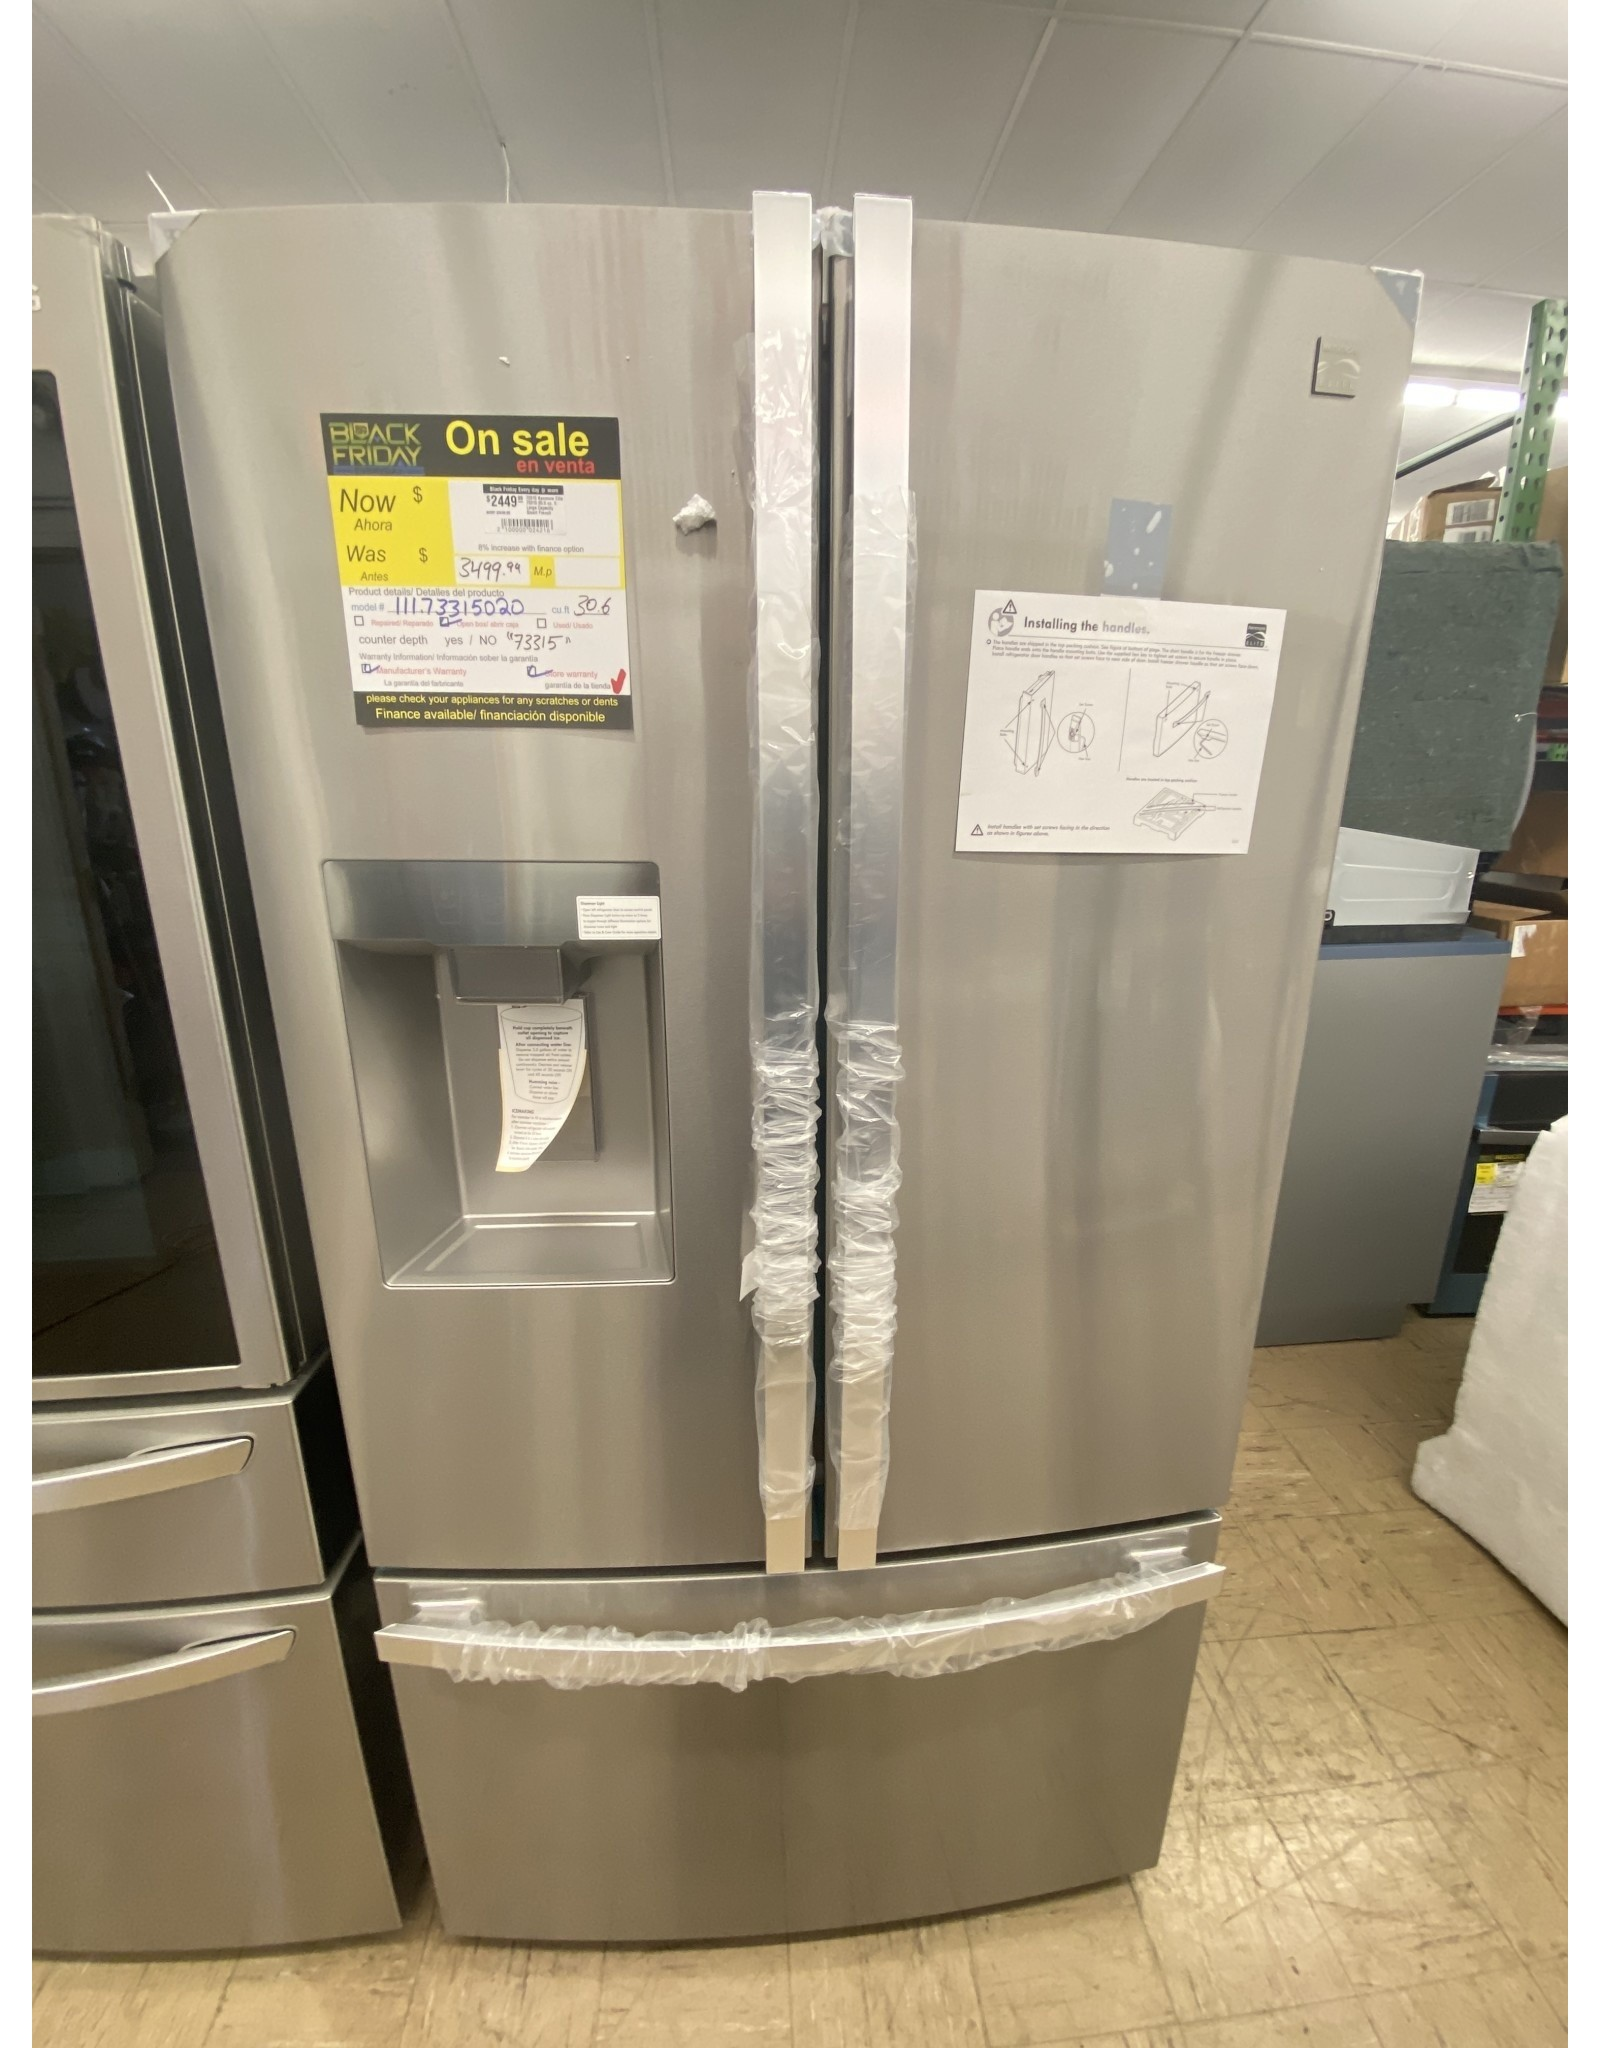 KENMORE ELITE 73315 Kenmore Elite 73315 30.6 cu. ft. Large Capacity Smart French Door Refrigerator - Fingerprint Resistant Stainless Steel